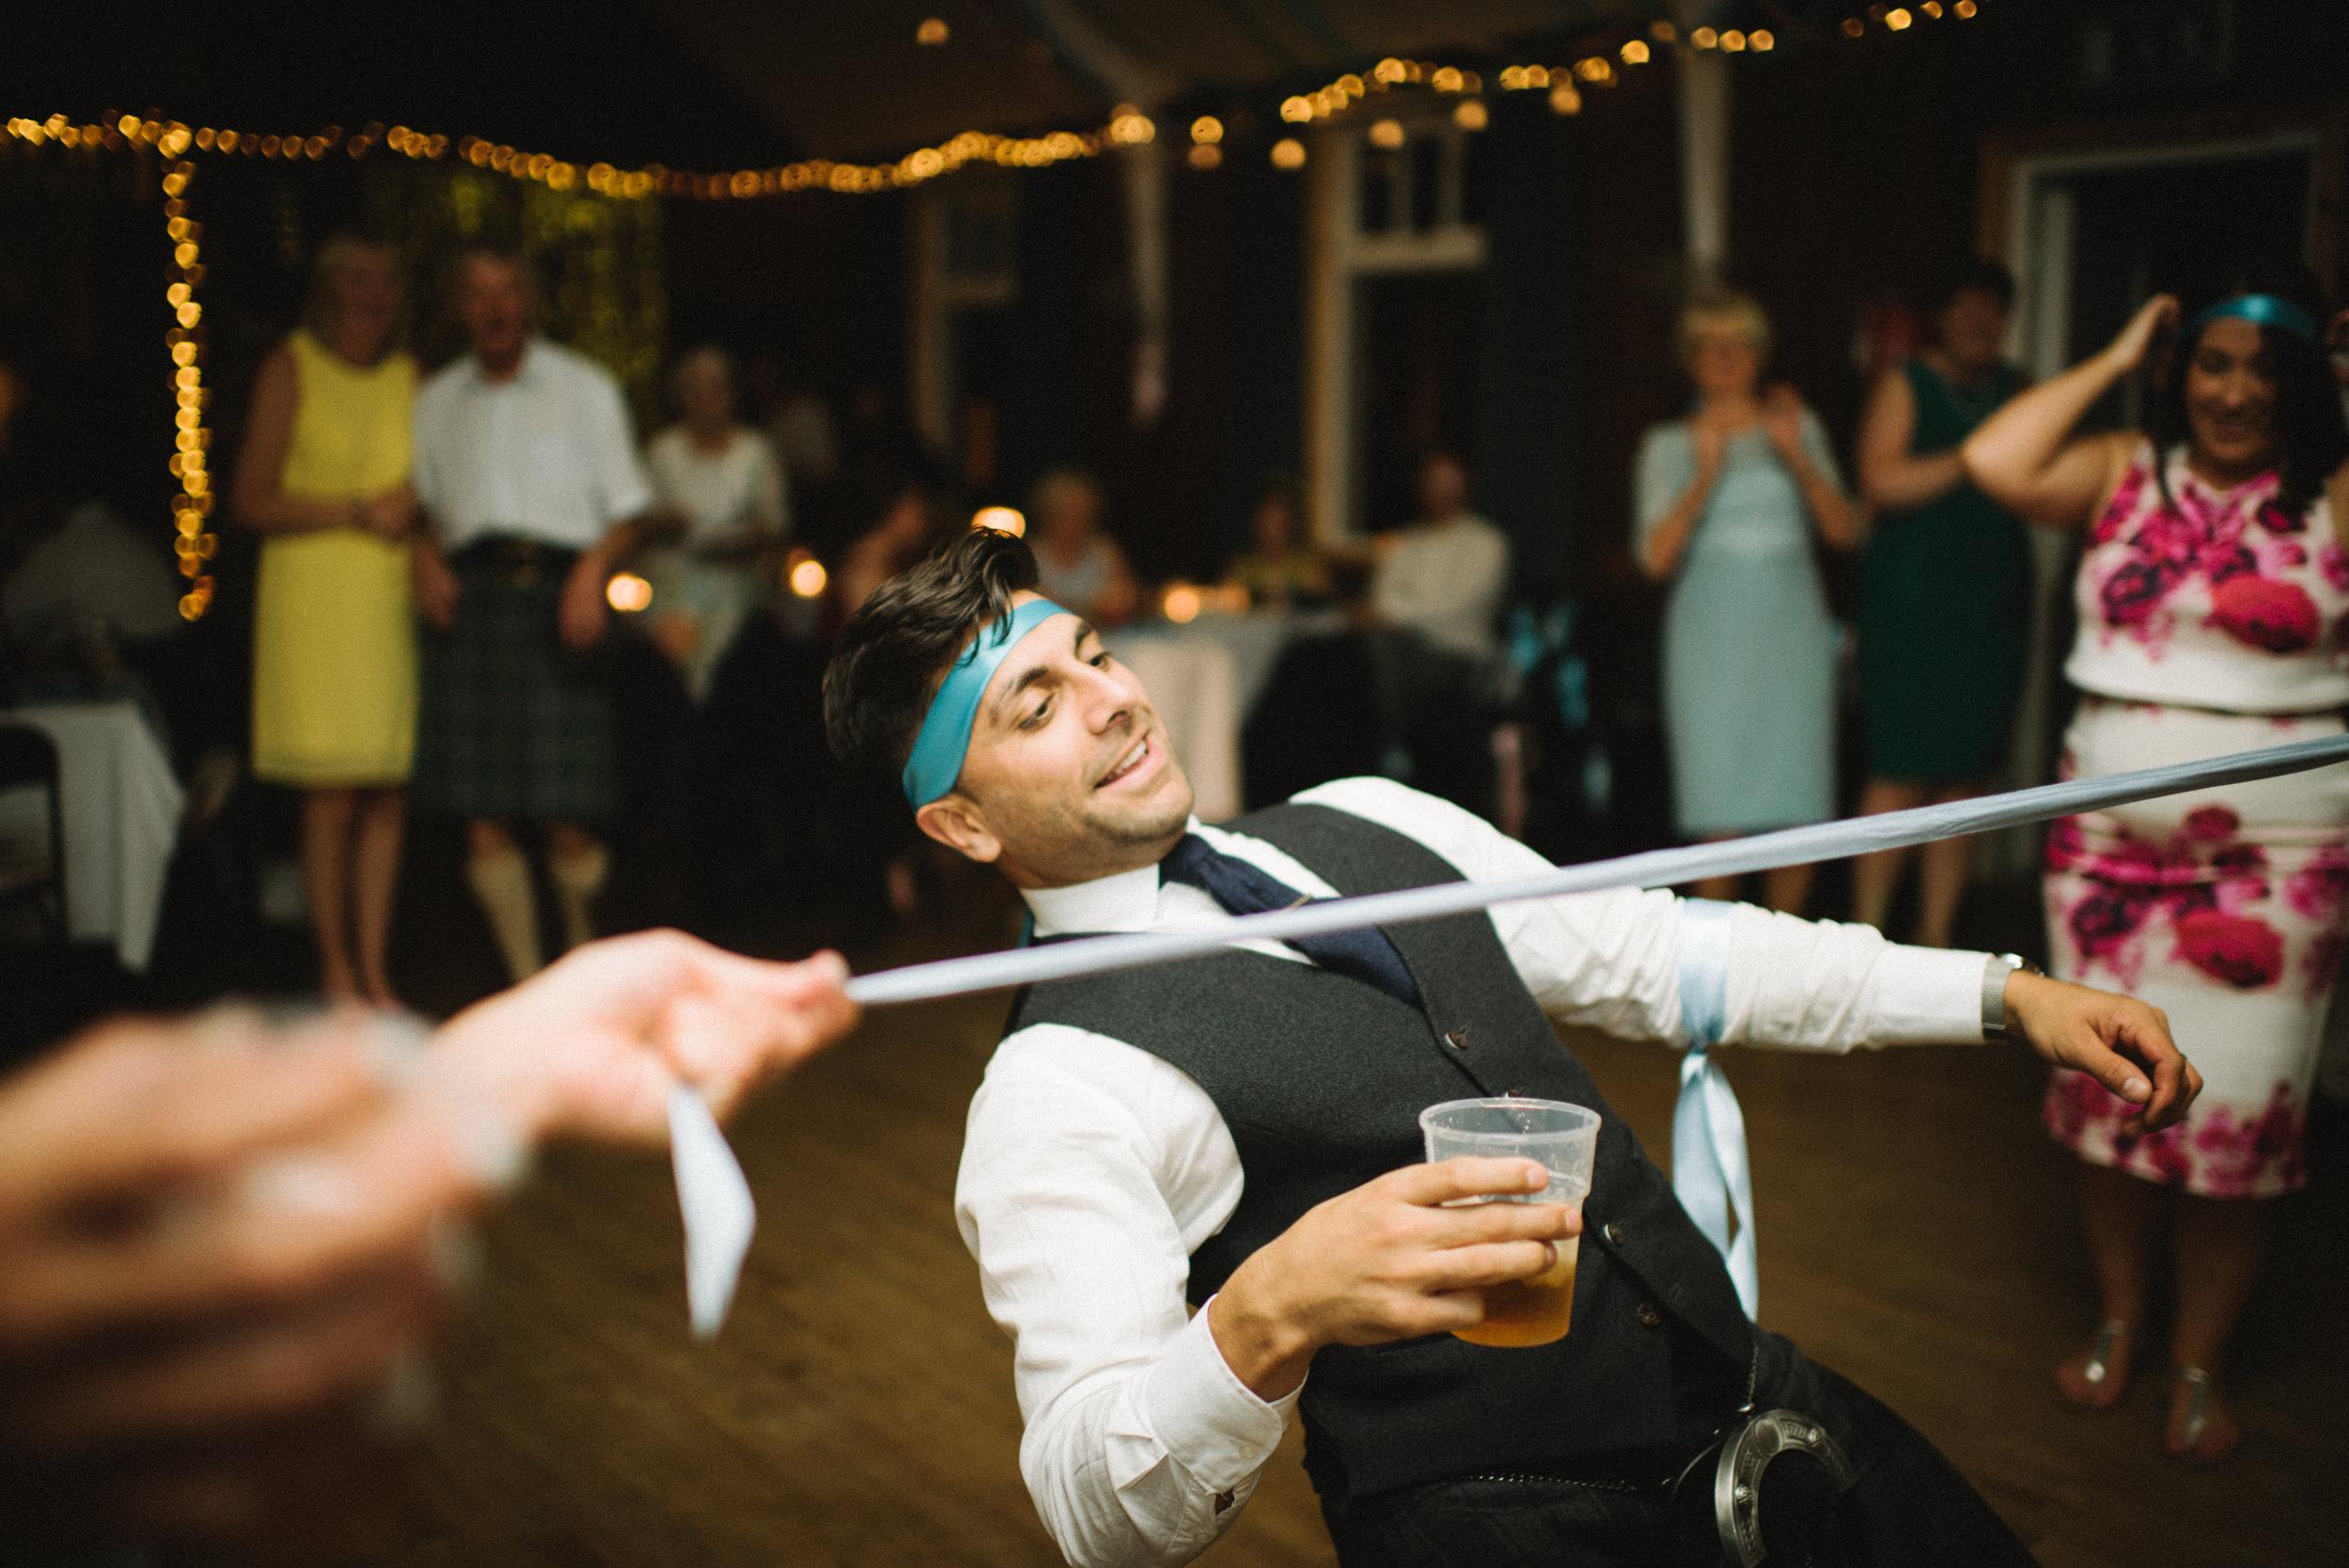 0091-alternative-wedding-portrait-family-kids-photographer-glasgow-scotland.JPG